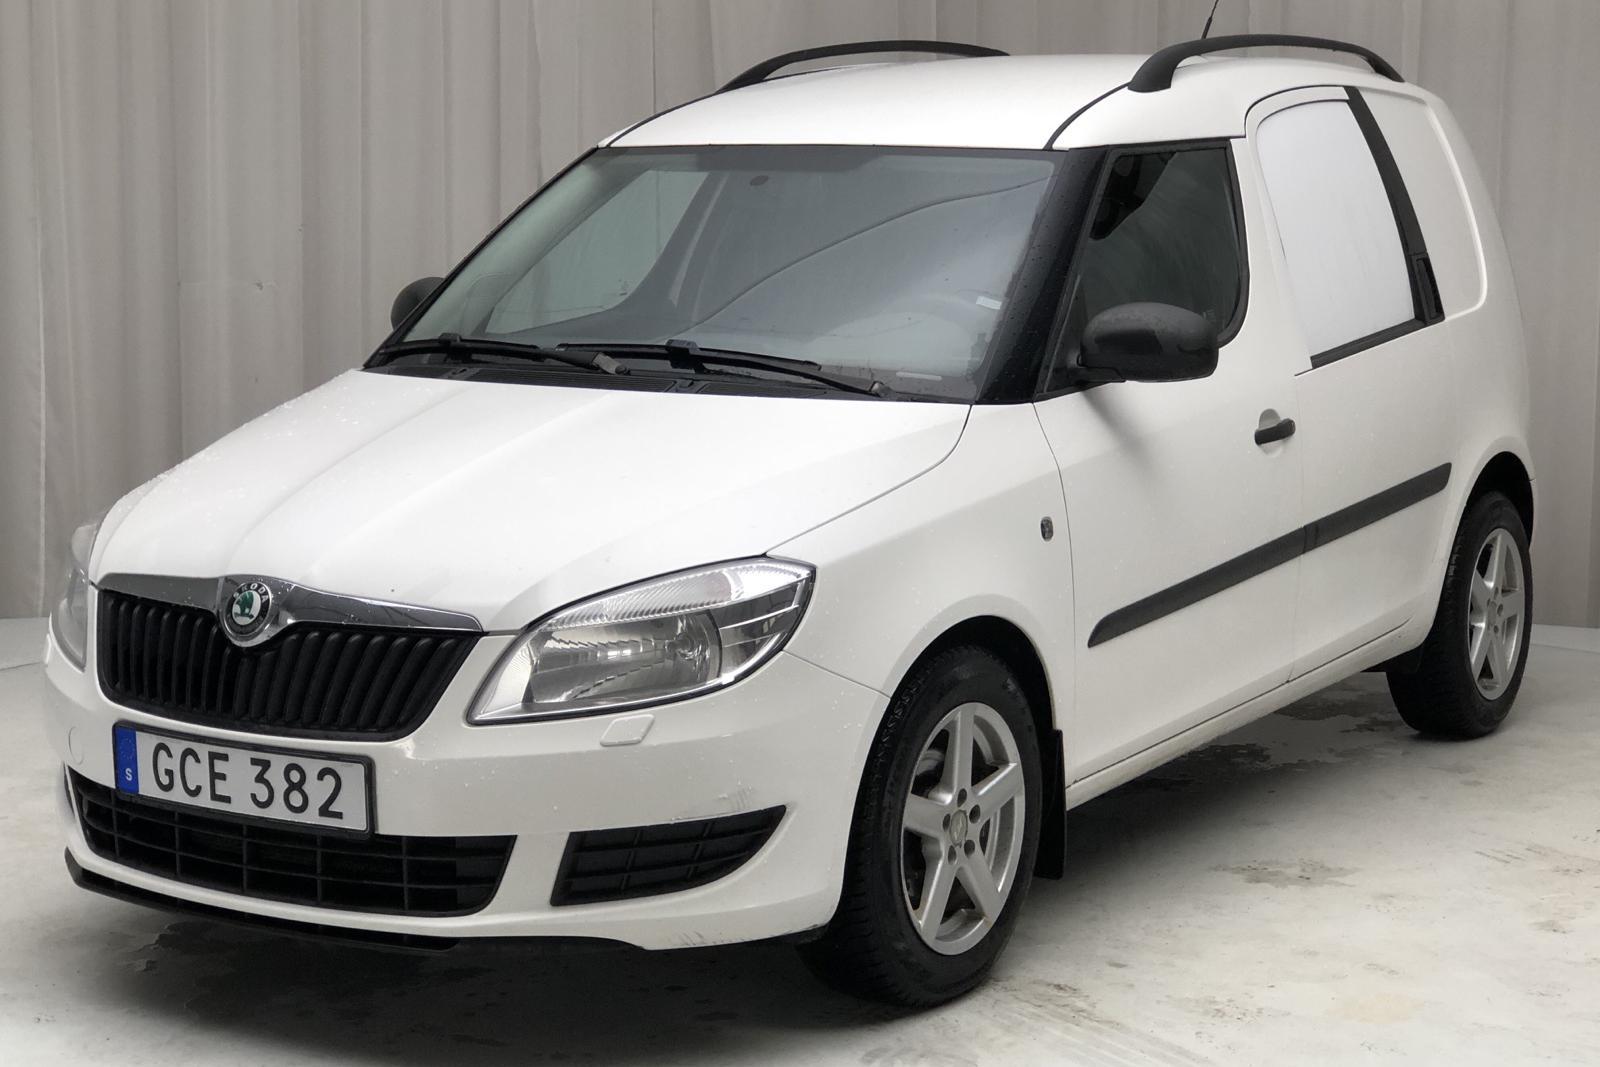 Skoda Praktik 1.2 TSI (86hk) - 226 216 km - Manual - white - 2011